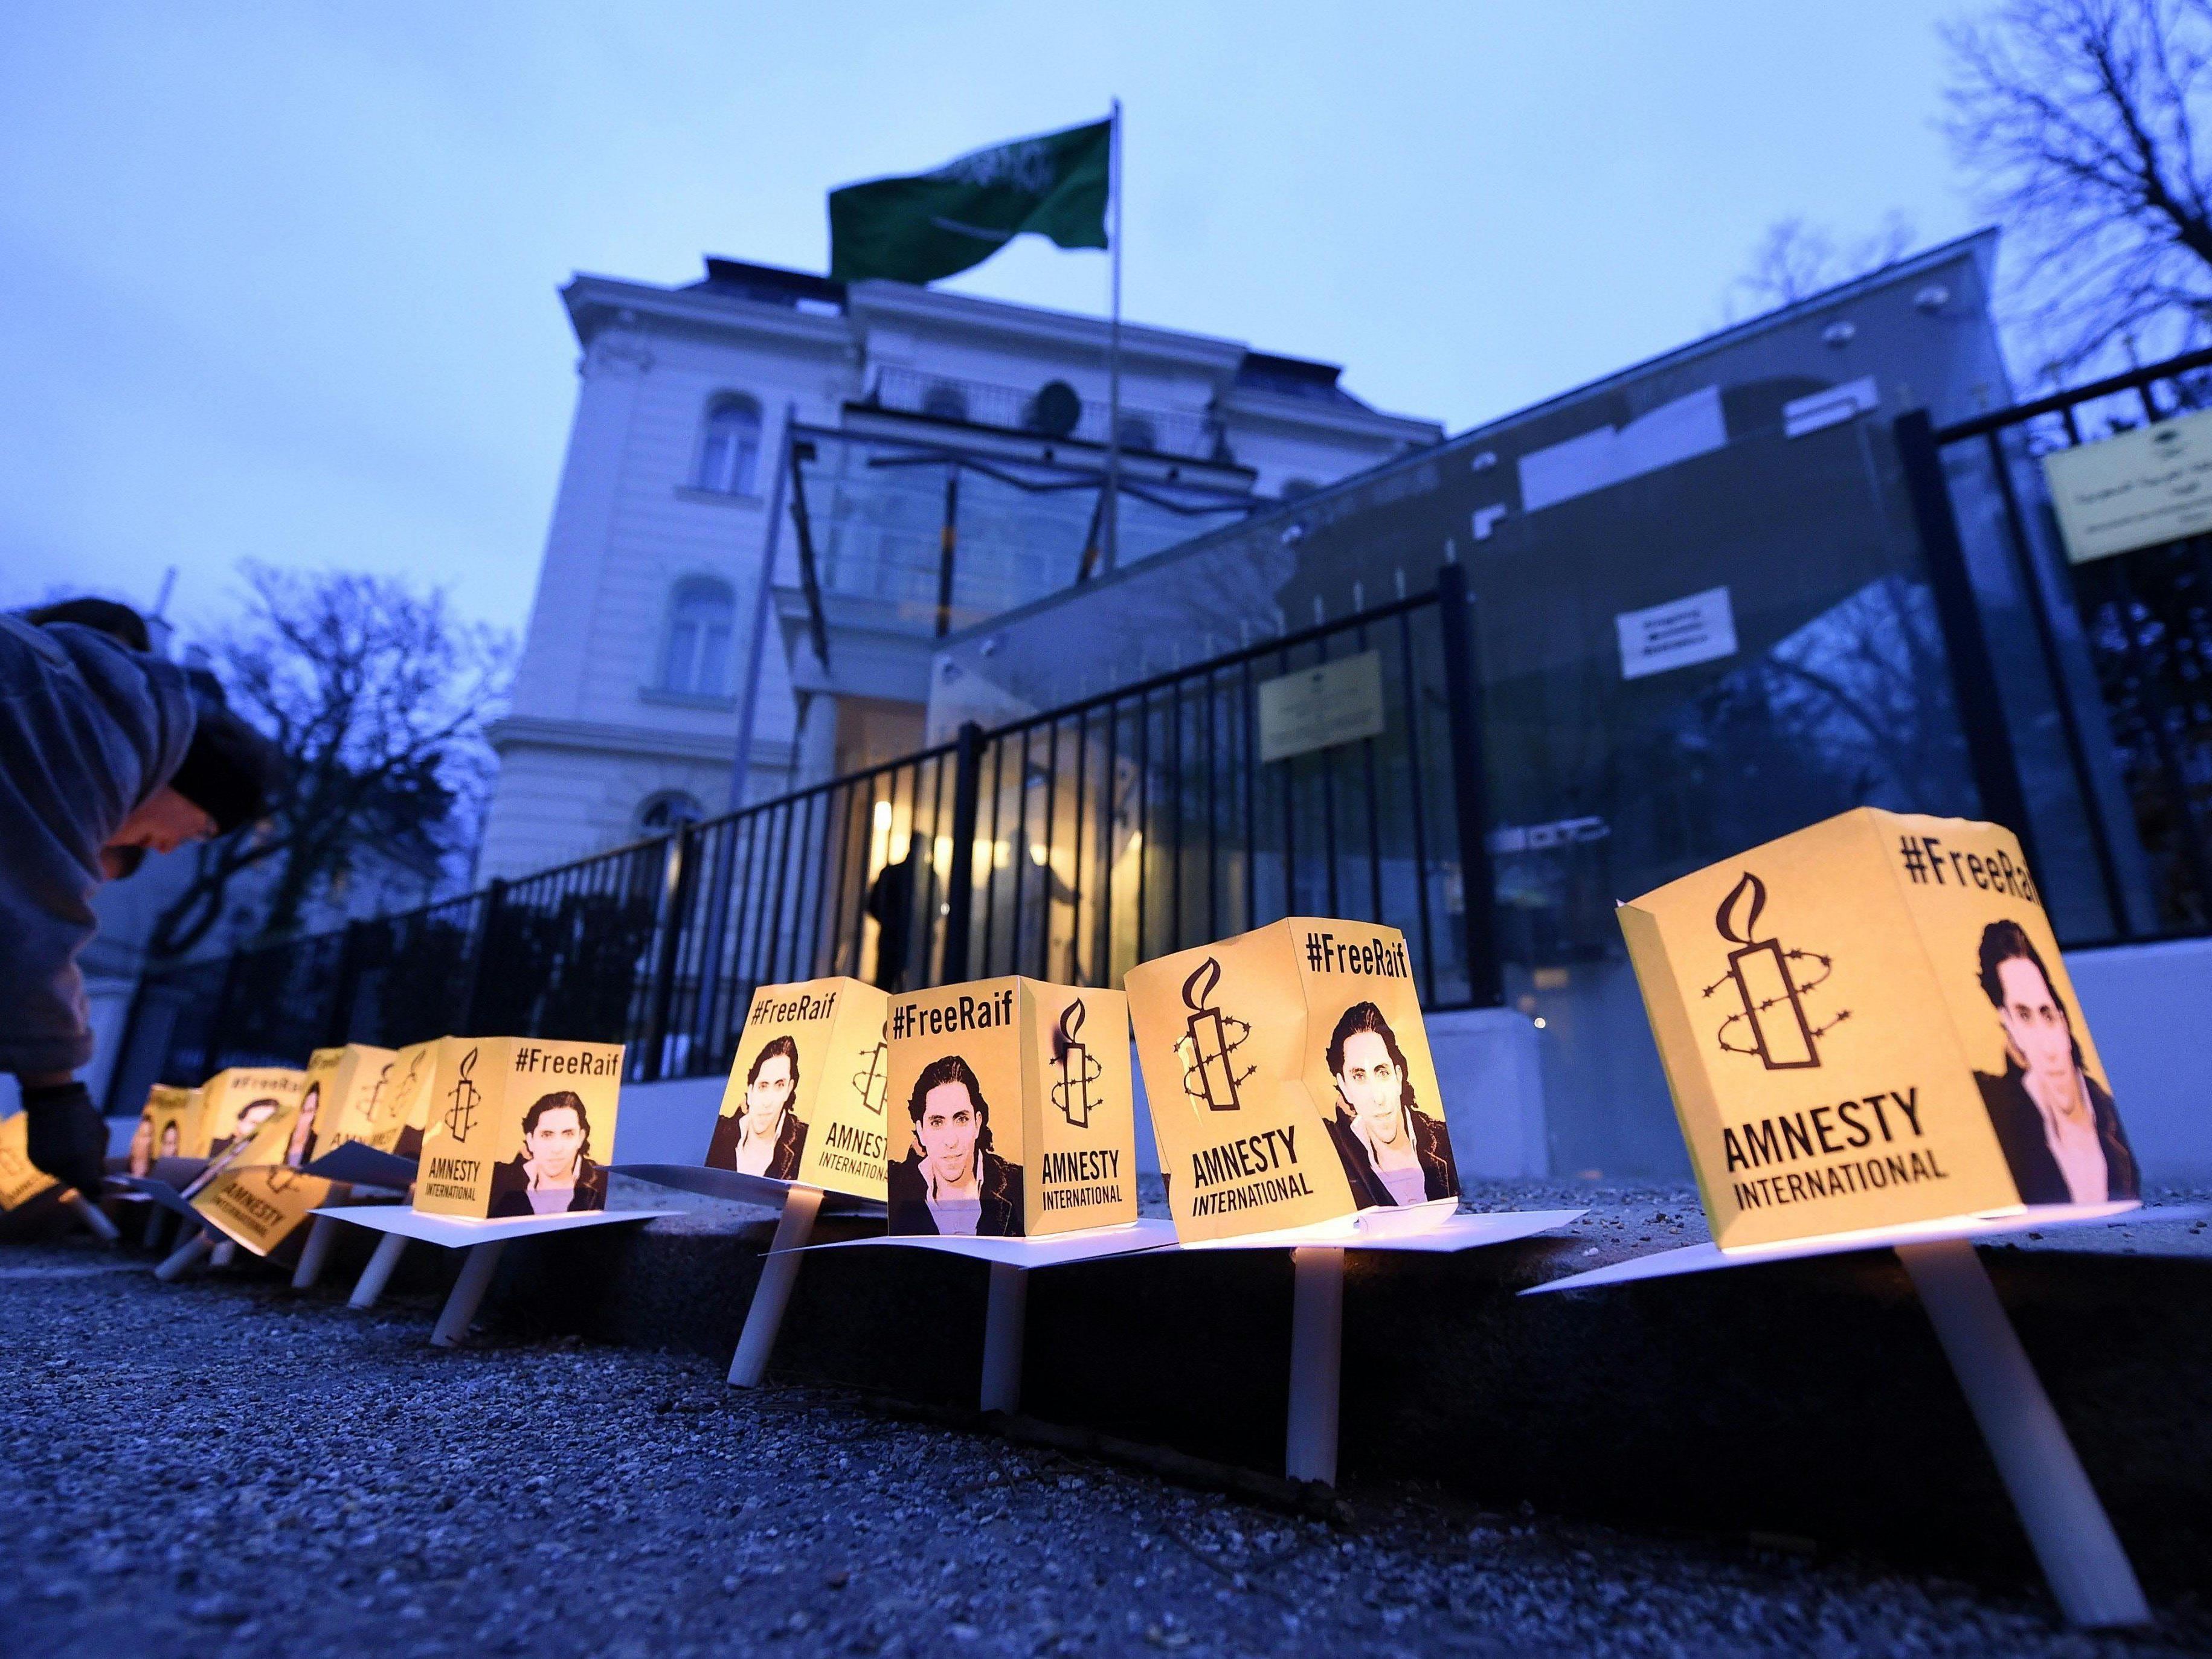 Trotz internationaler Kritik droht Badawi die nächste Tranche an Stockschlägen.